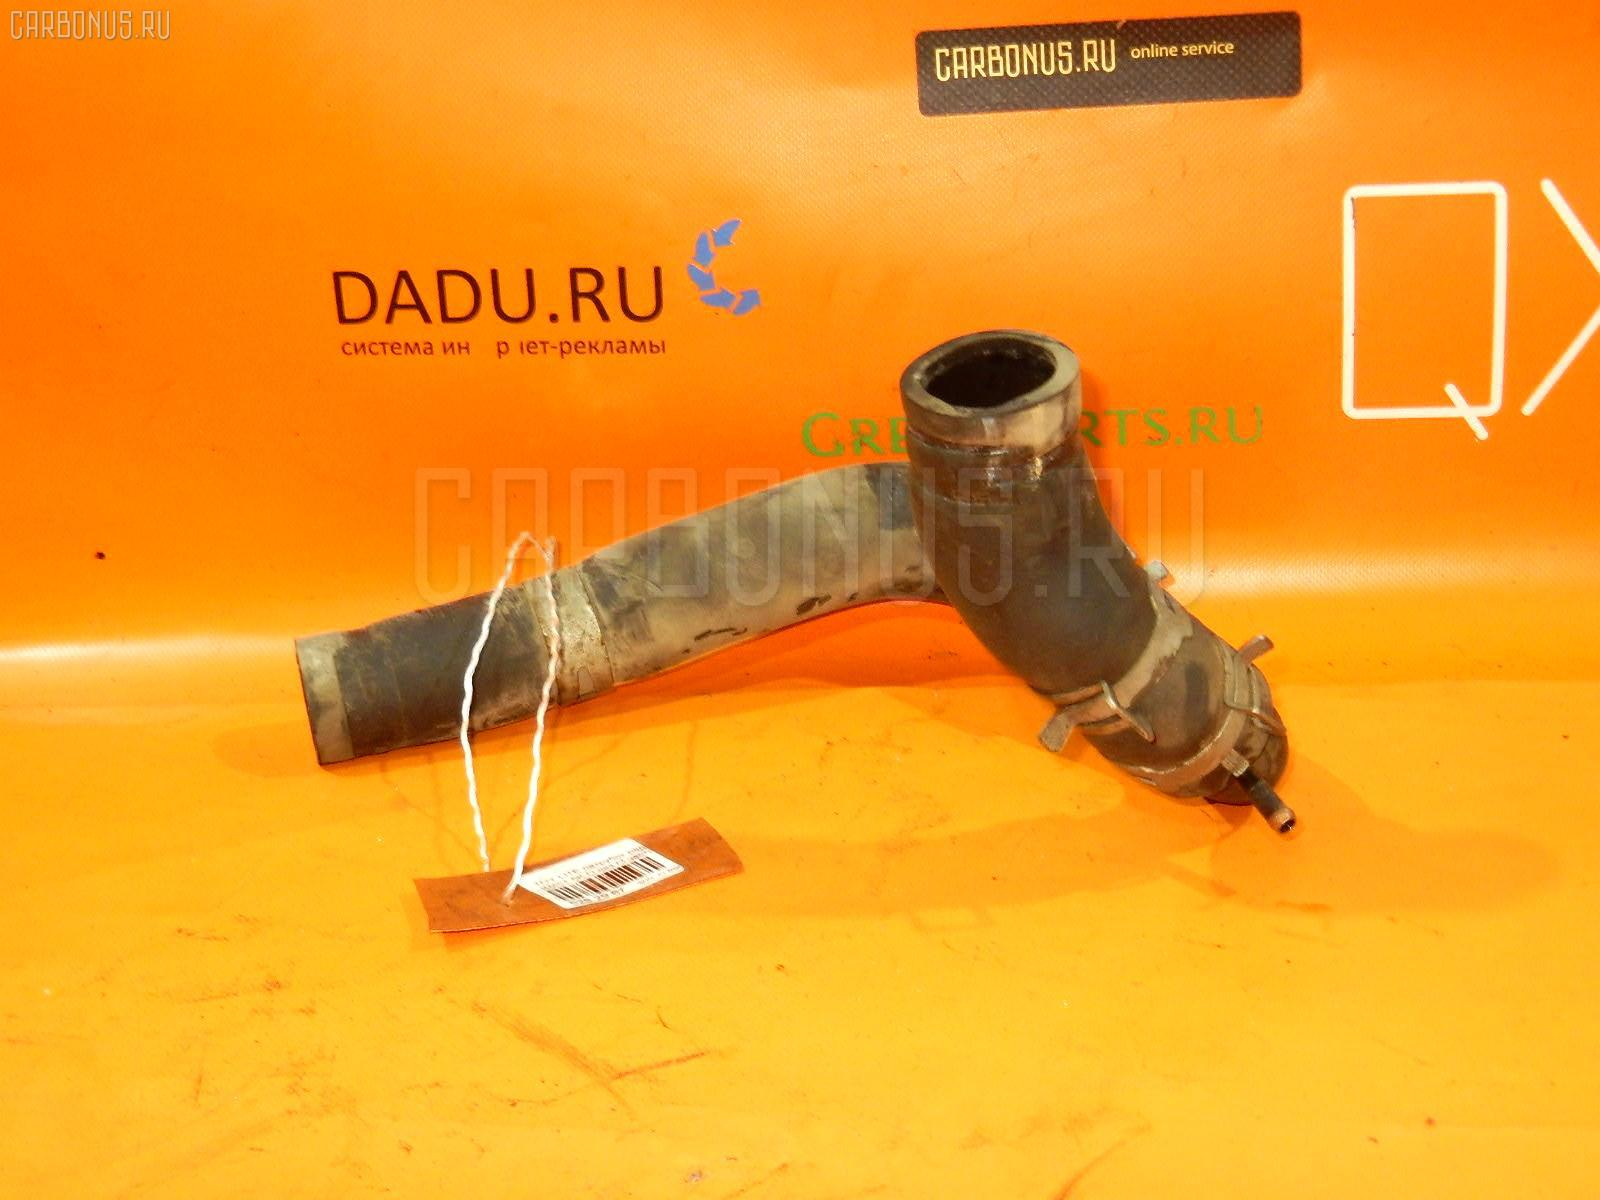 Патрубок радиатора ДВС TOYOTA LITE ACE KM51 5K Фото 1